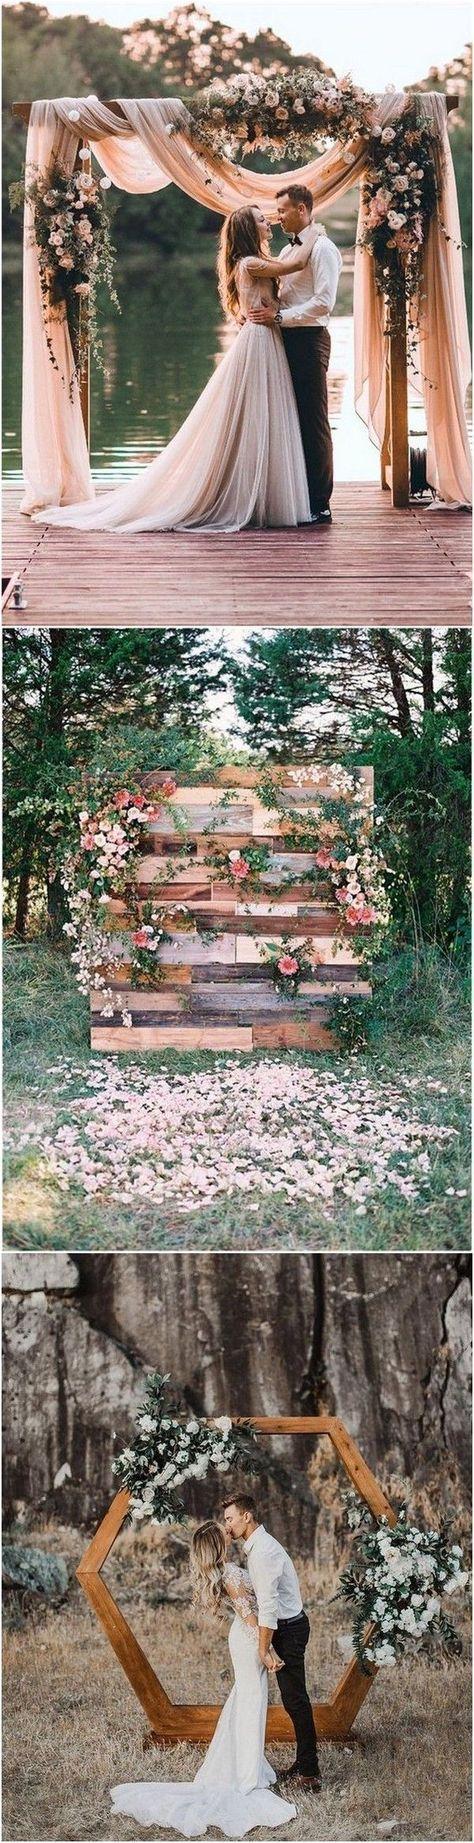 30+ Breathtaking Outdoor Wedding Ideas to Love